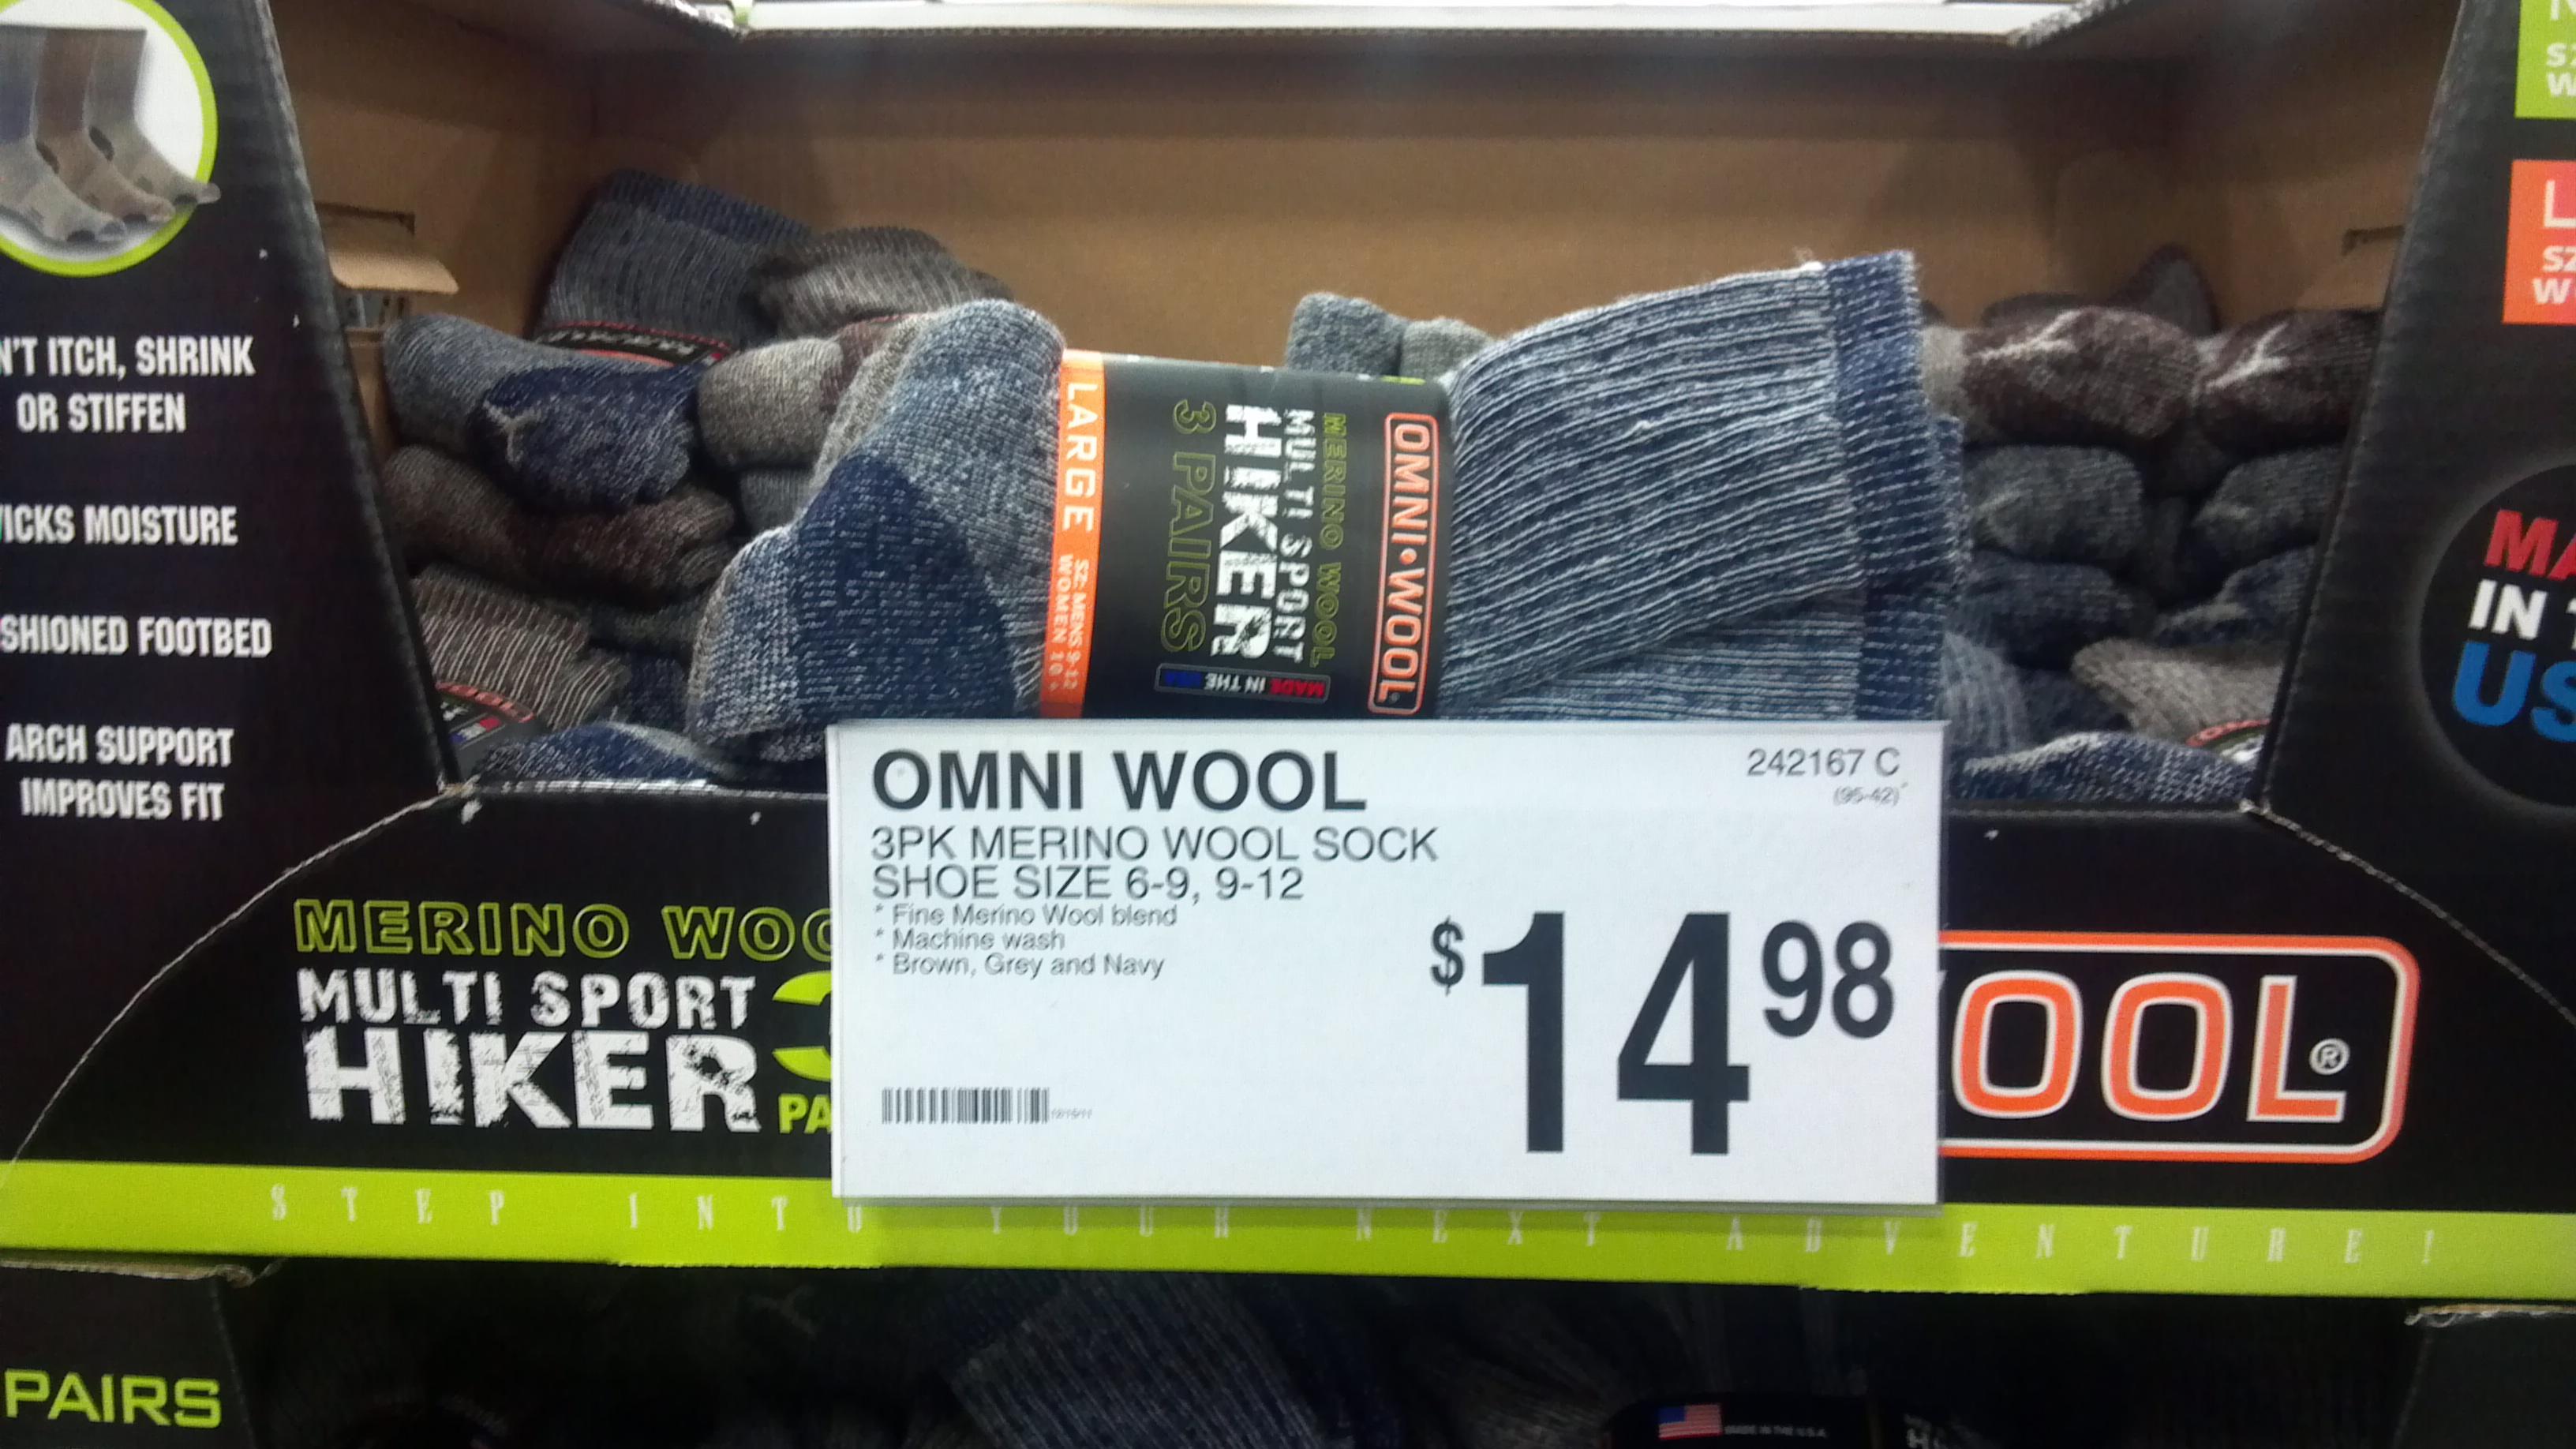 Merino Wool Socks Review, OMNI WOOL, SAMS Club